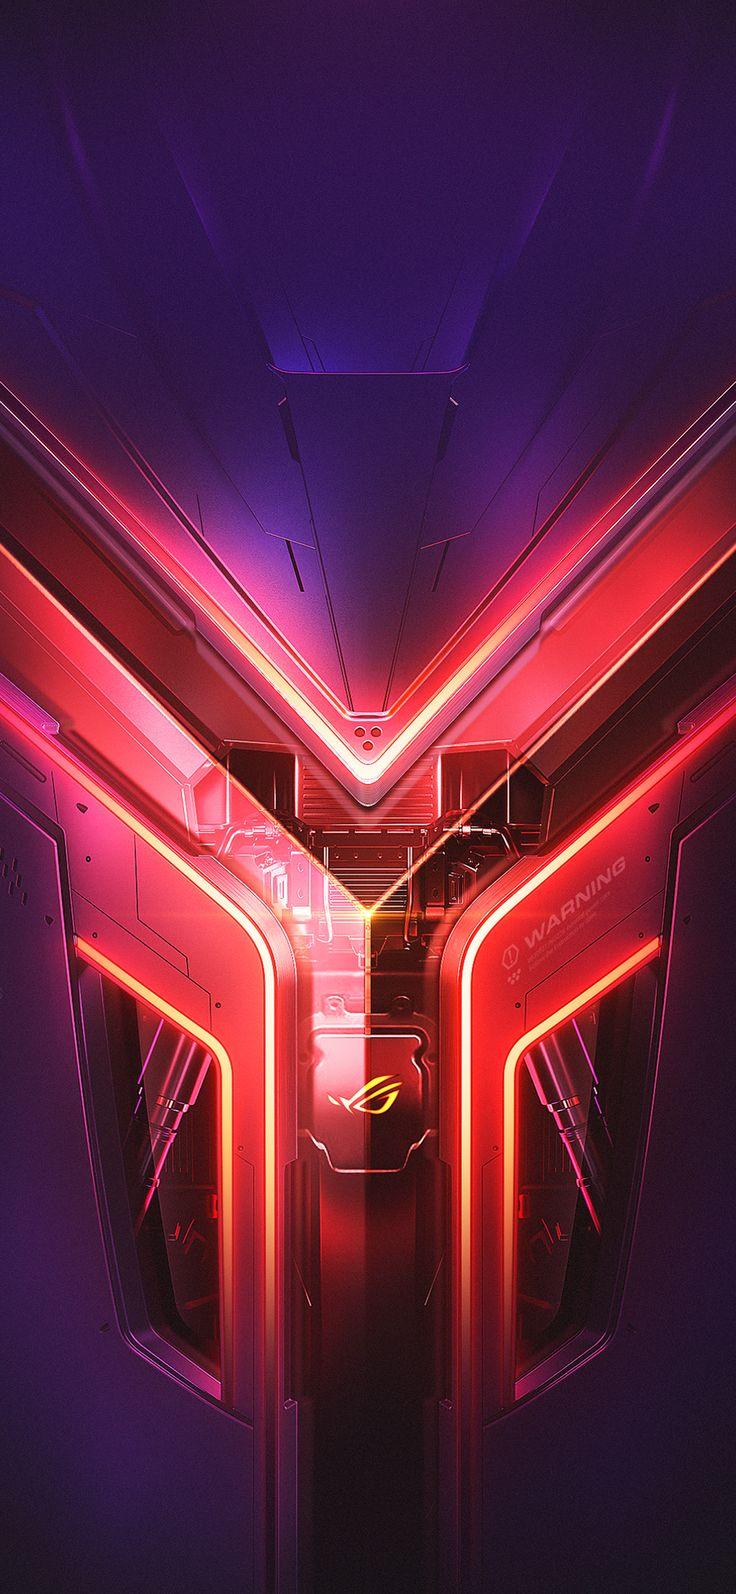 Descargar Asus Rog Phone 3 Stock Wallpapers Fhd In 2020 Gaming Wallpapers Hd Phone Wallpaper Design Stock Wallpaper